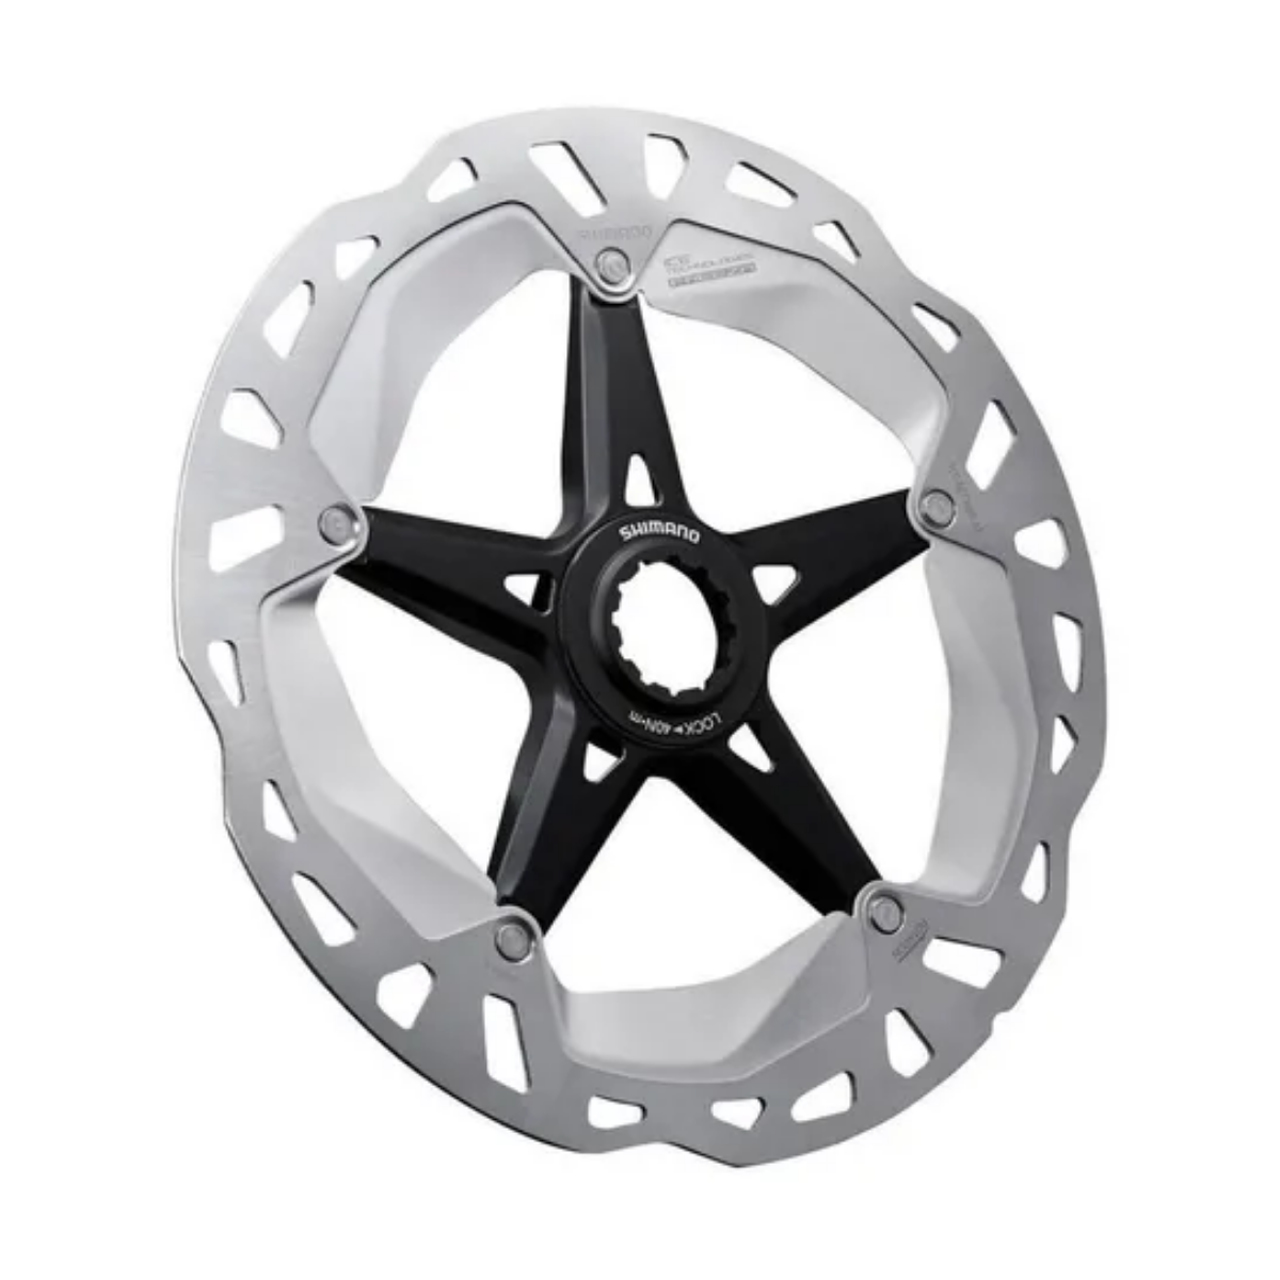 Disco Rotor Shimano RT-MT800 160mm Ice Tech Center Look